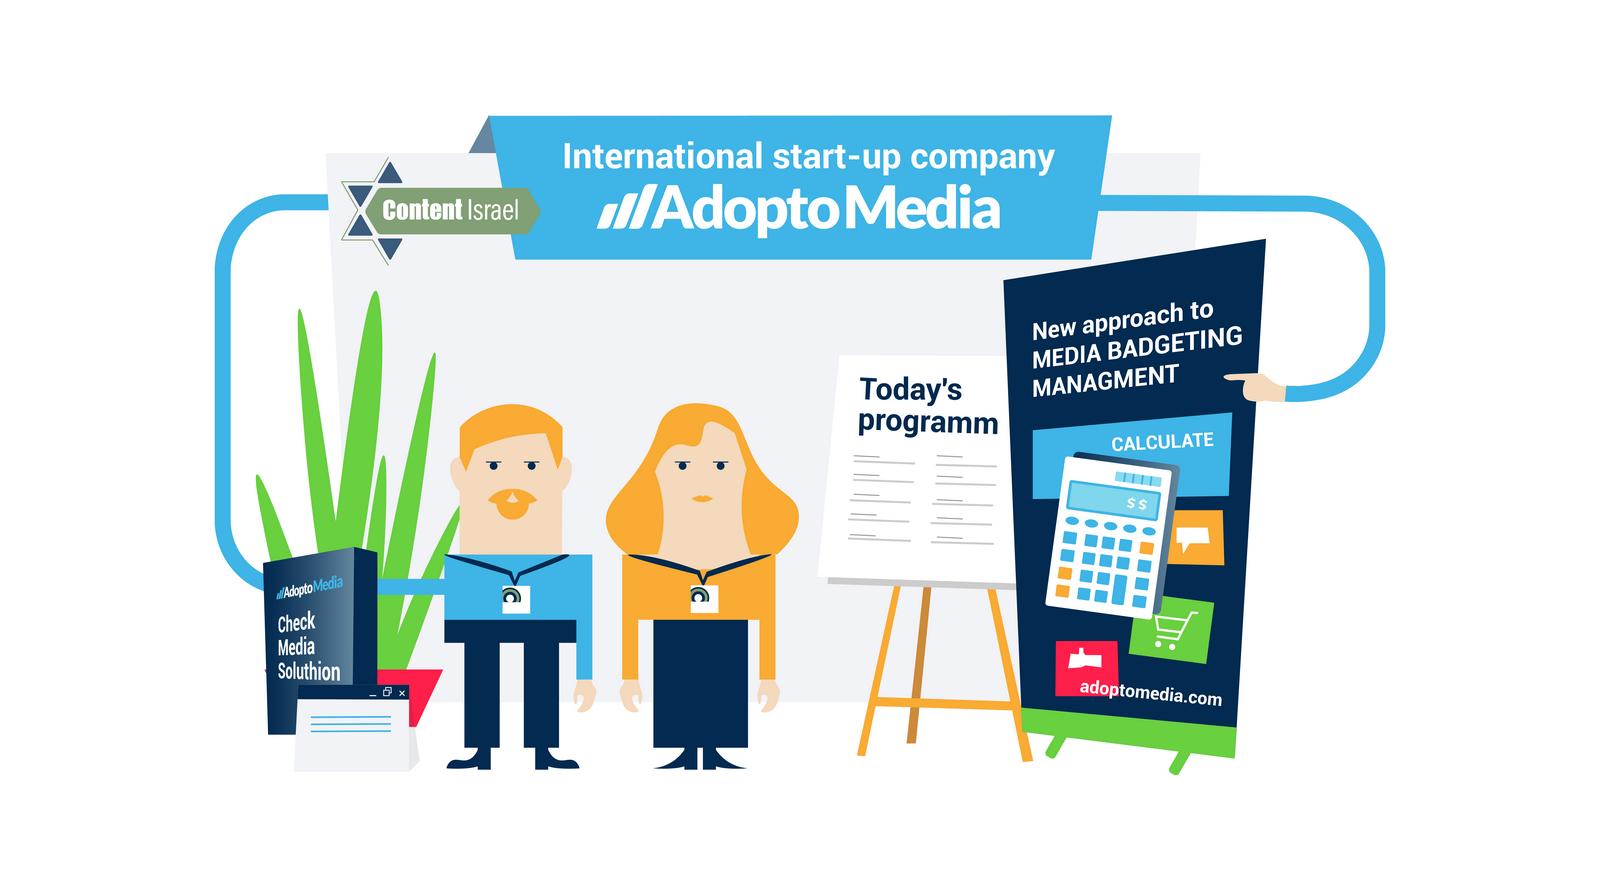 AdoptoMedia, Content Israel, content marketing, marketing, advertising budget optimization, advertising efficiency